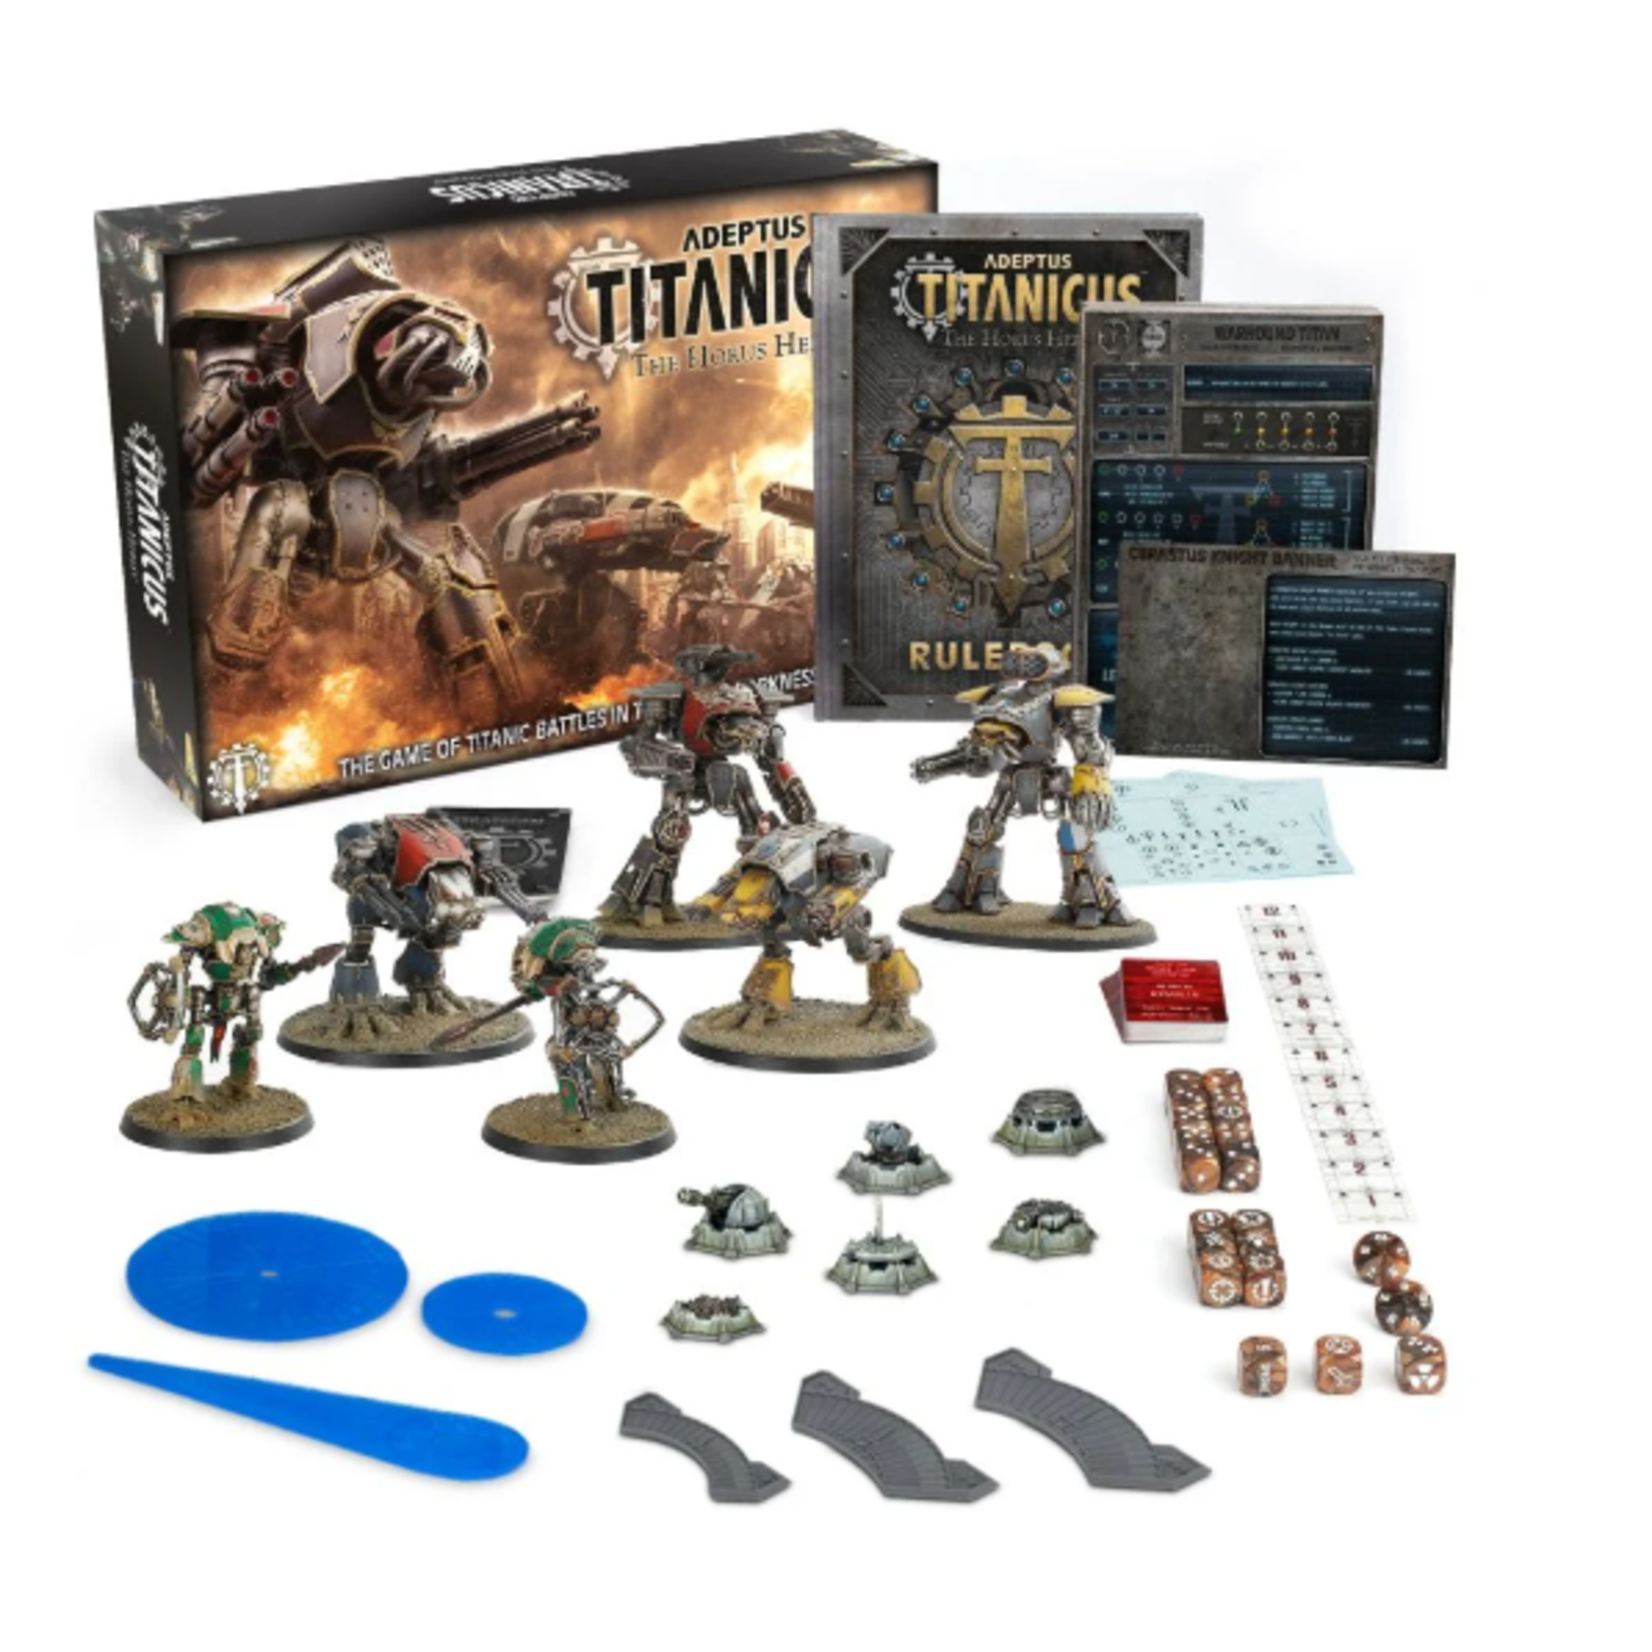 Games Workshop ADEPTUS TITANICUS STARTER SET